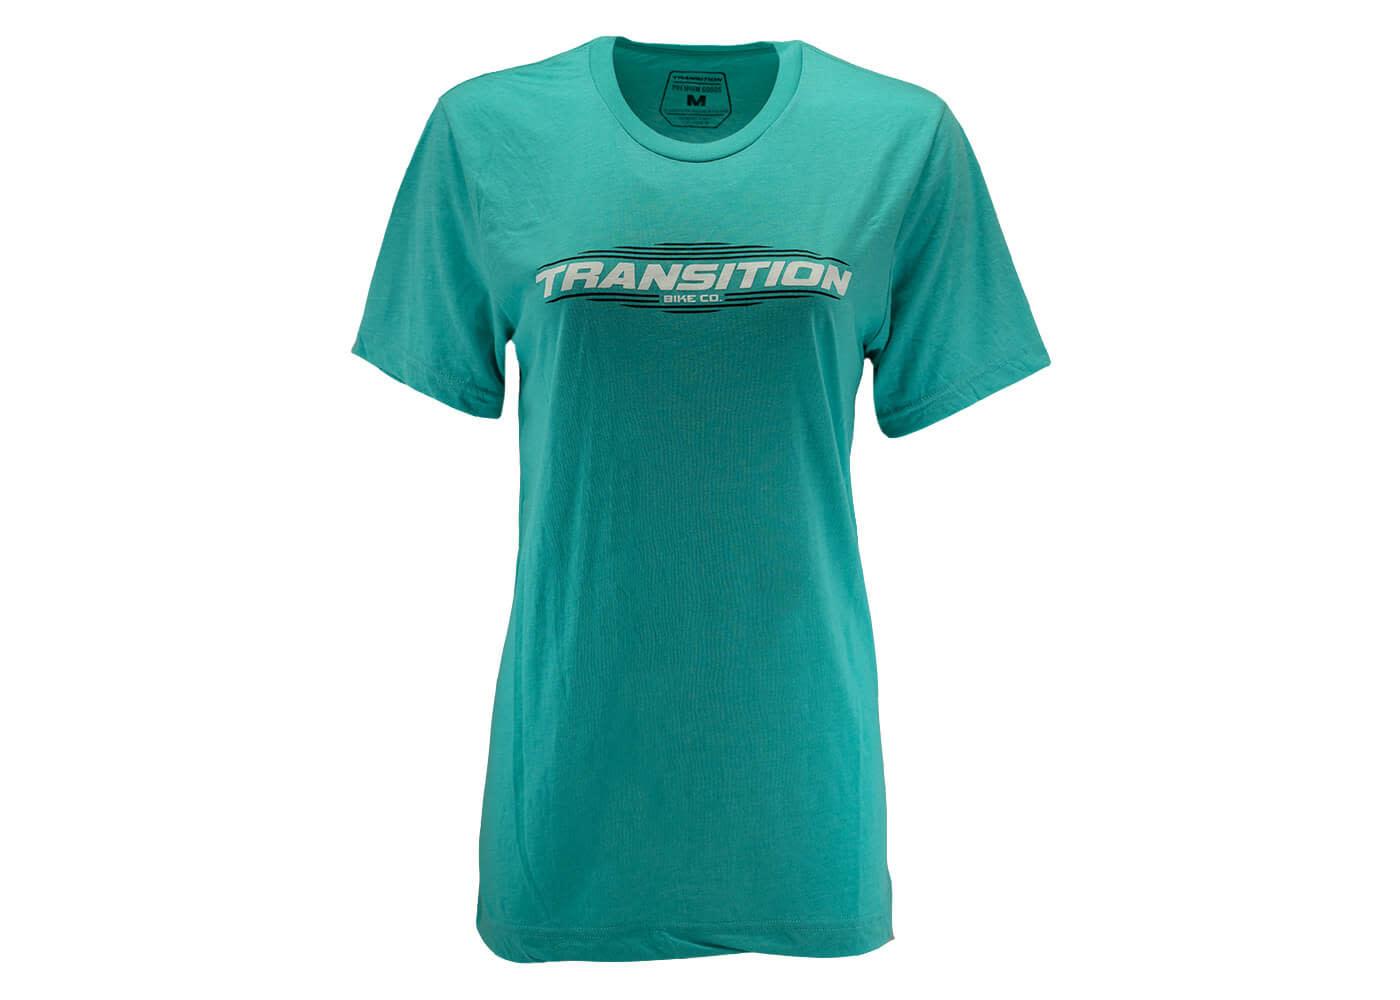 Transition Womens T-Shirt: Transition Logo (Medium, Coral Blue)